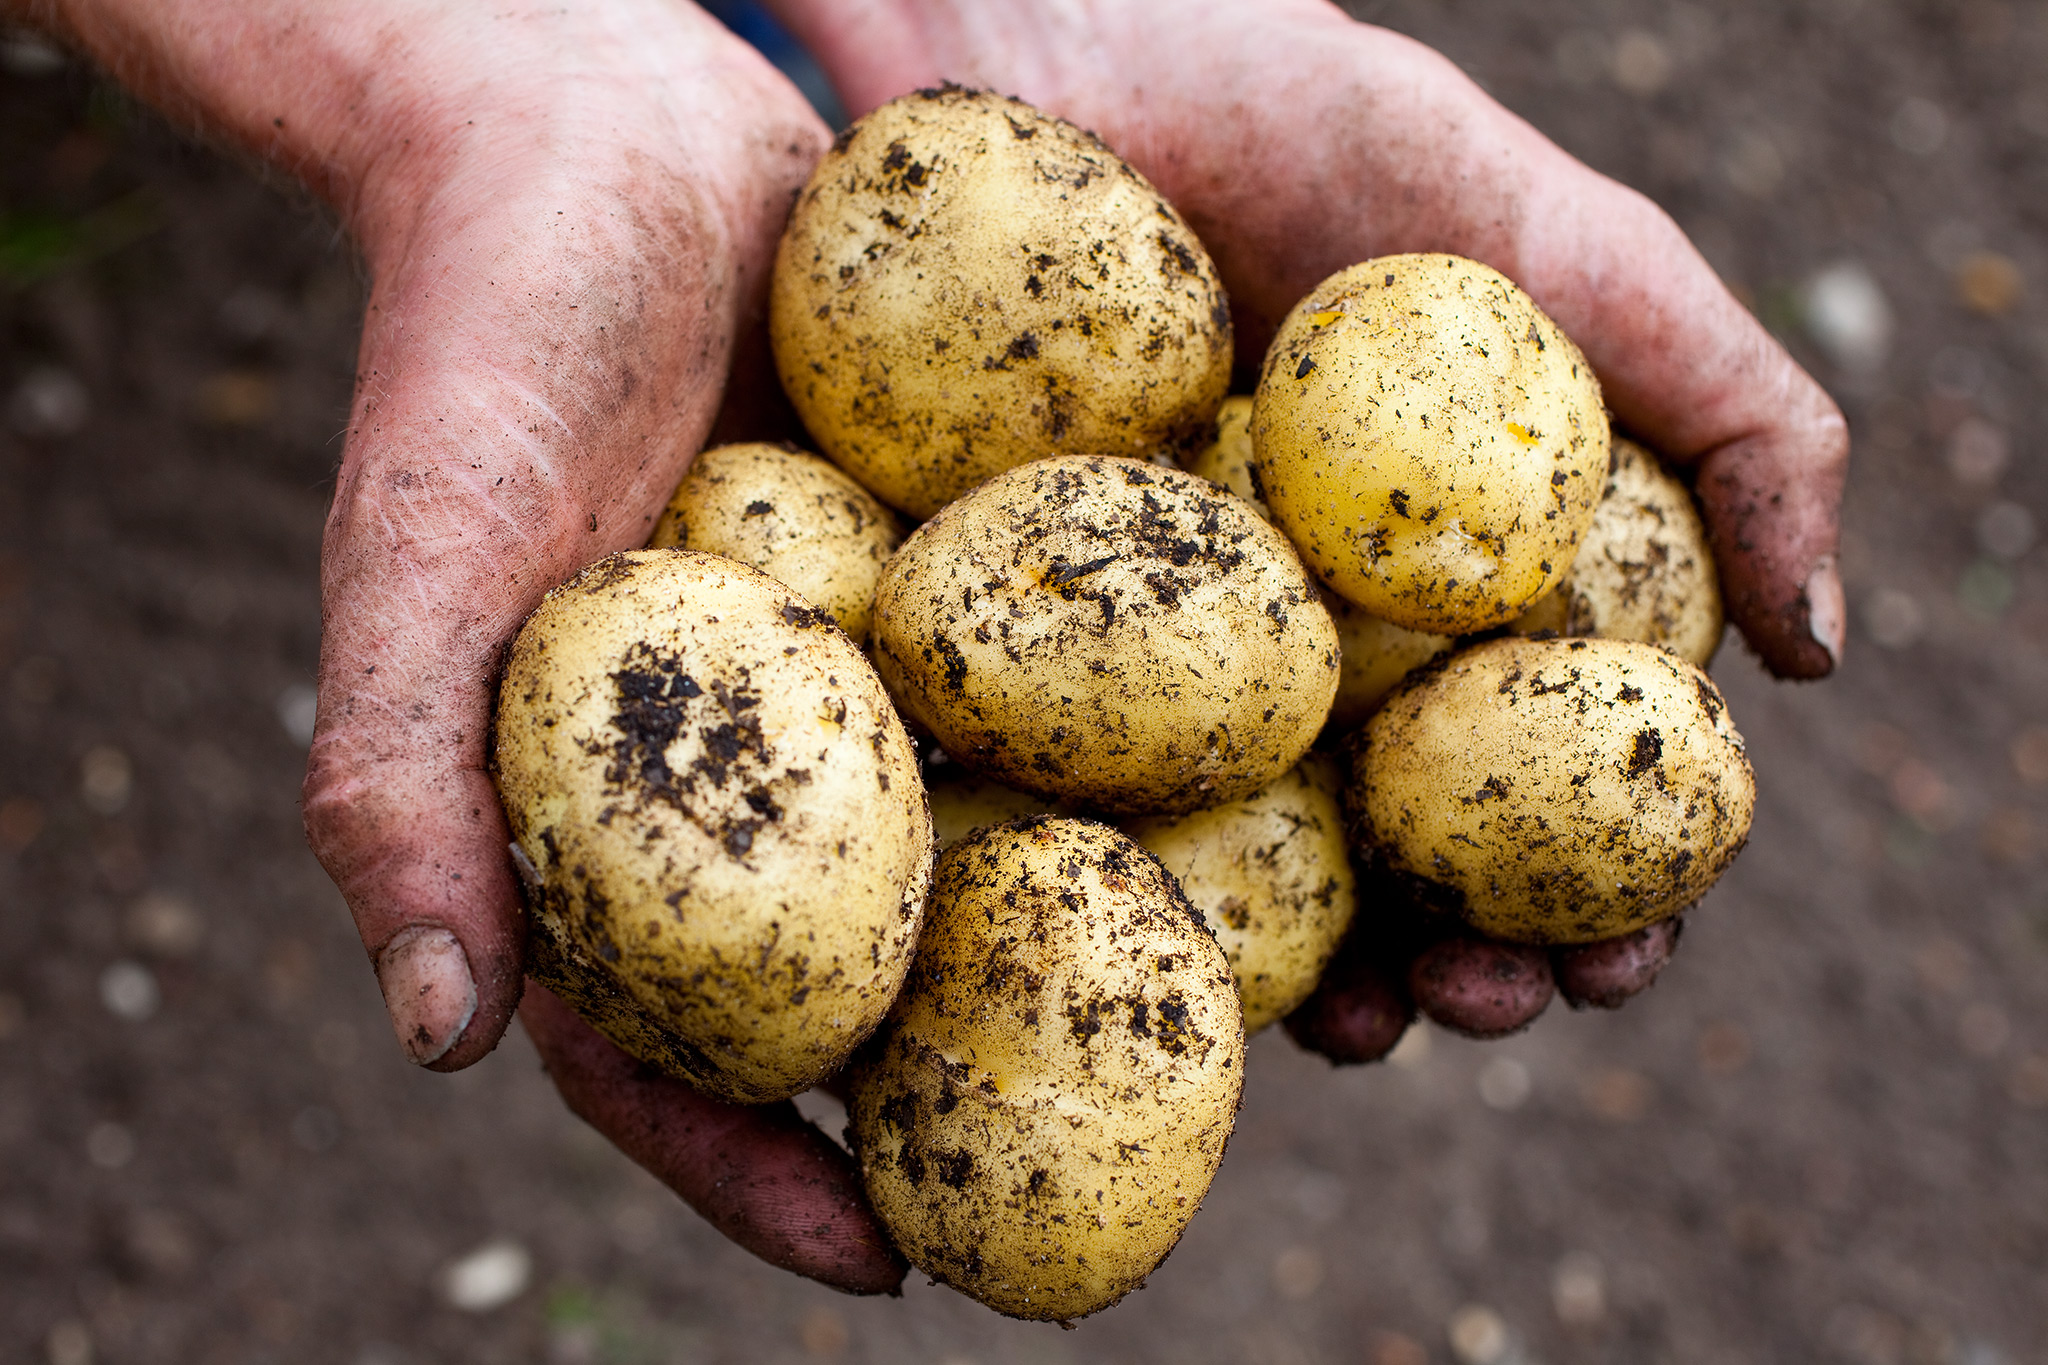 Freshly harvested potatoes